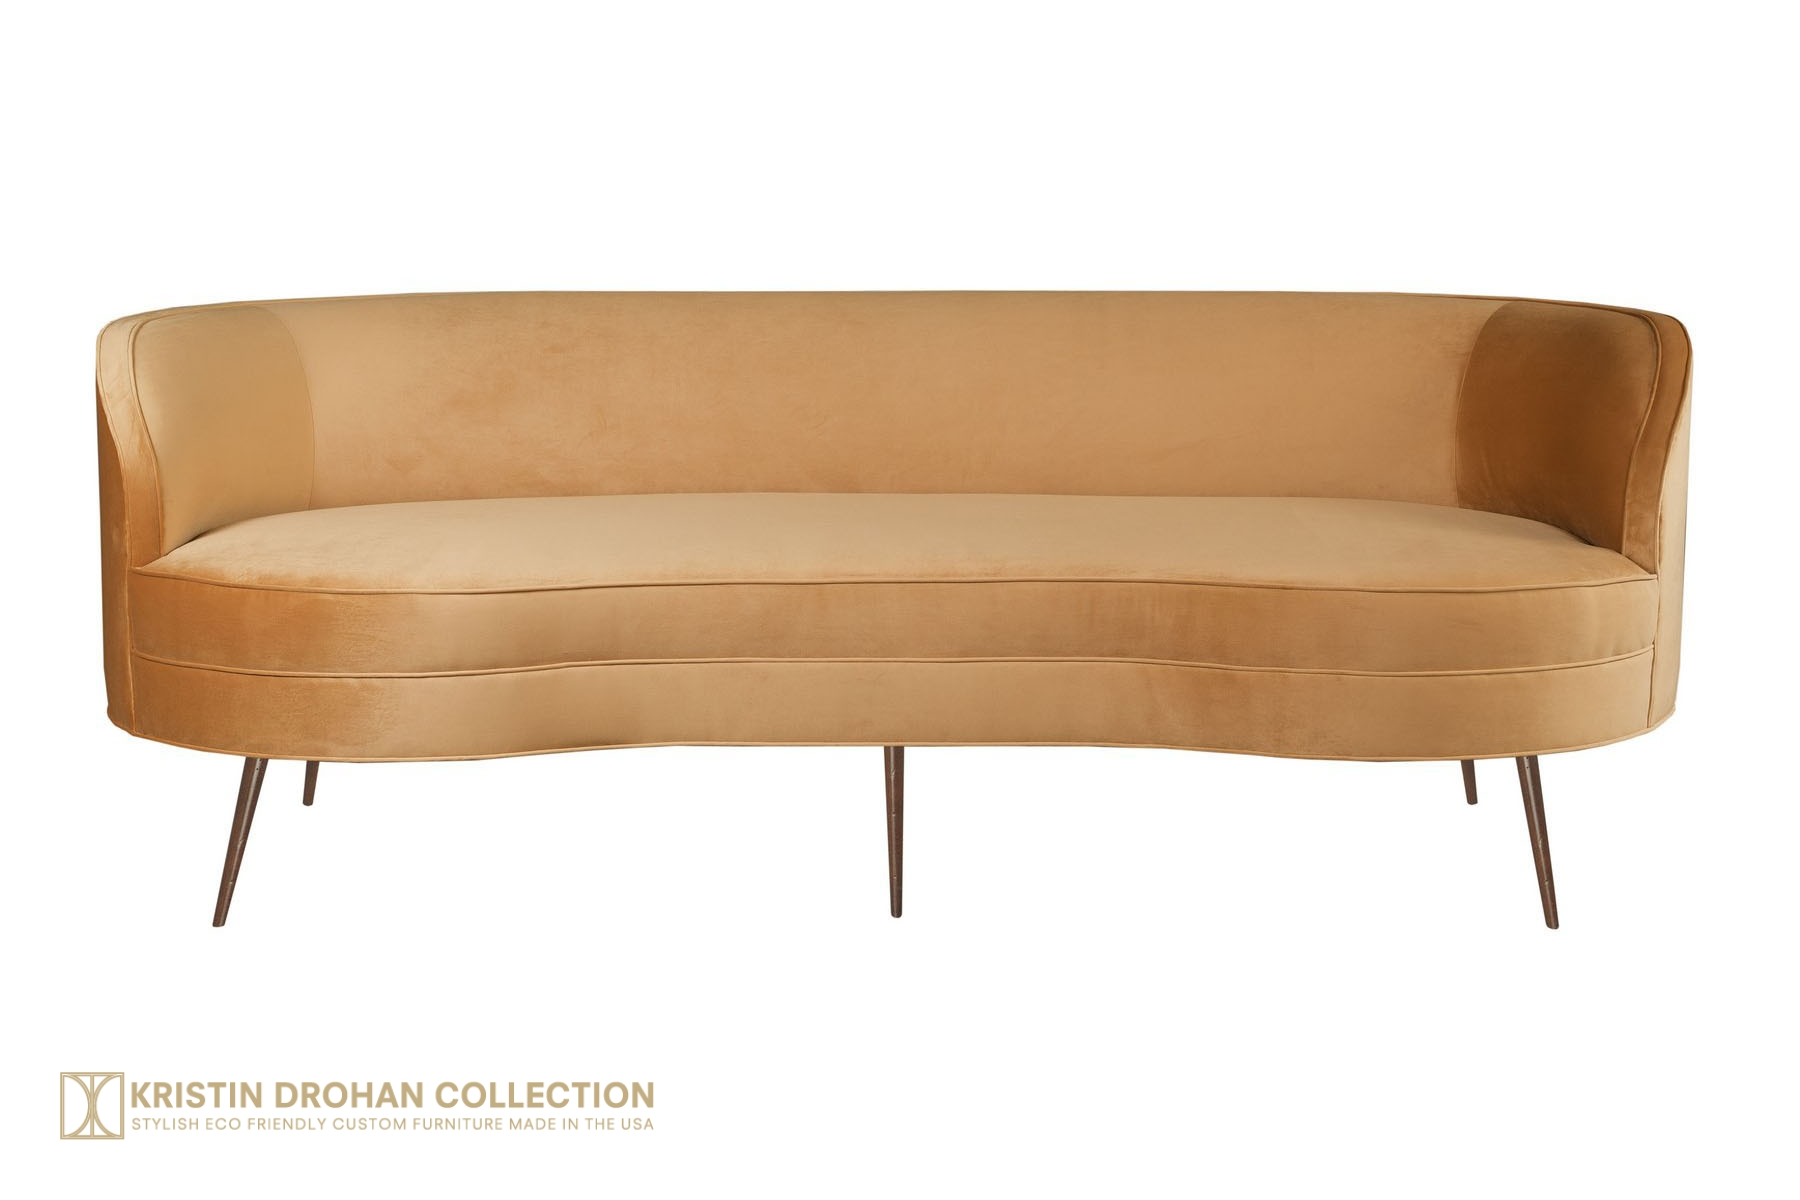 Sur mid-century modern sofa